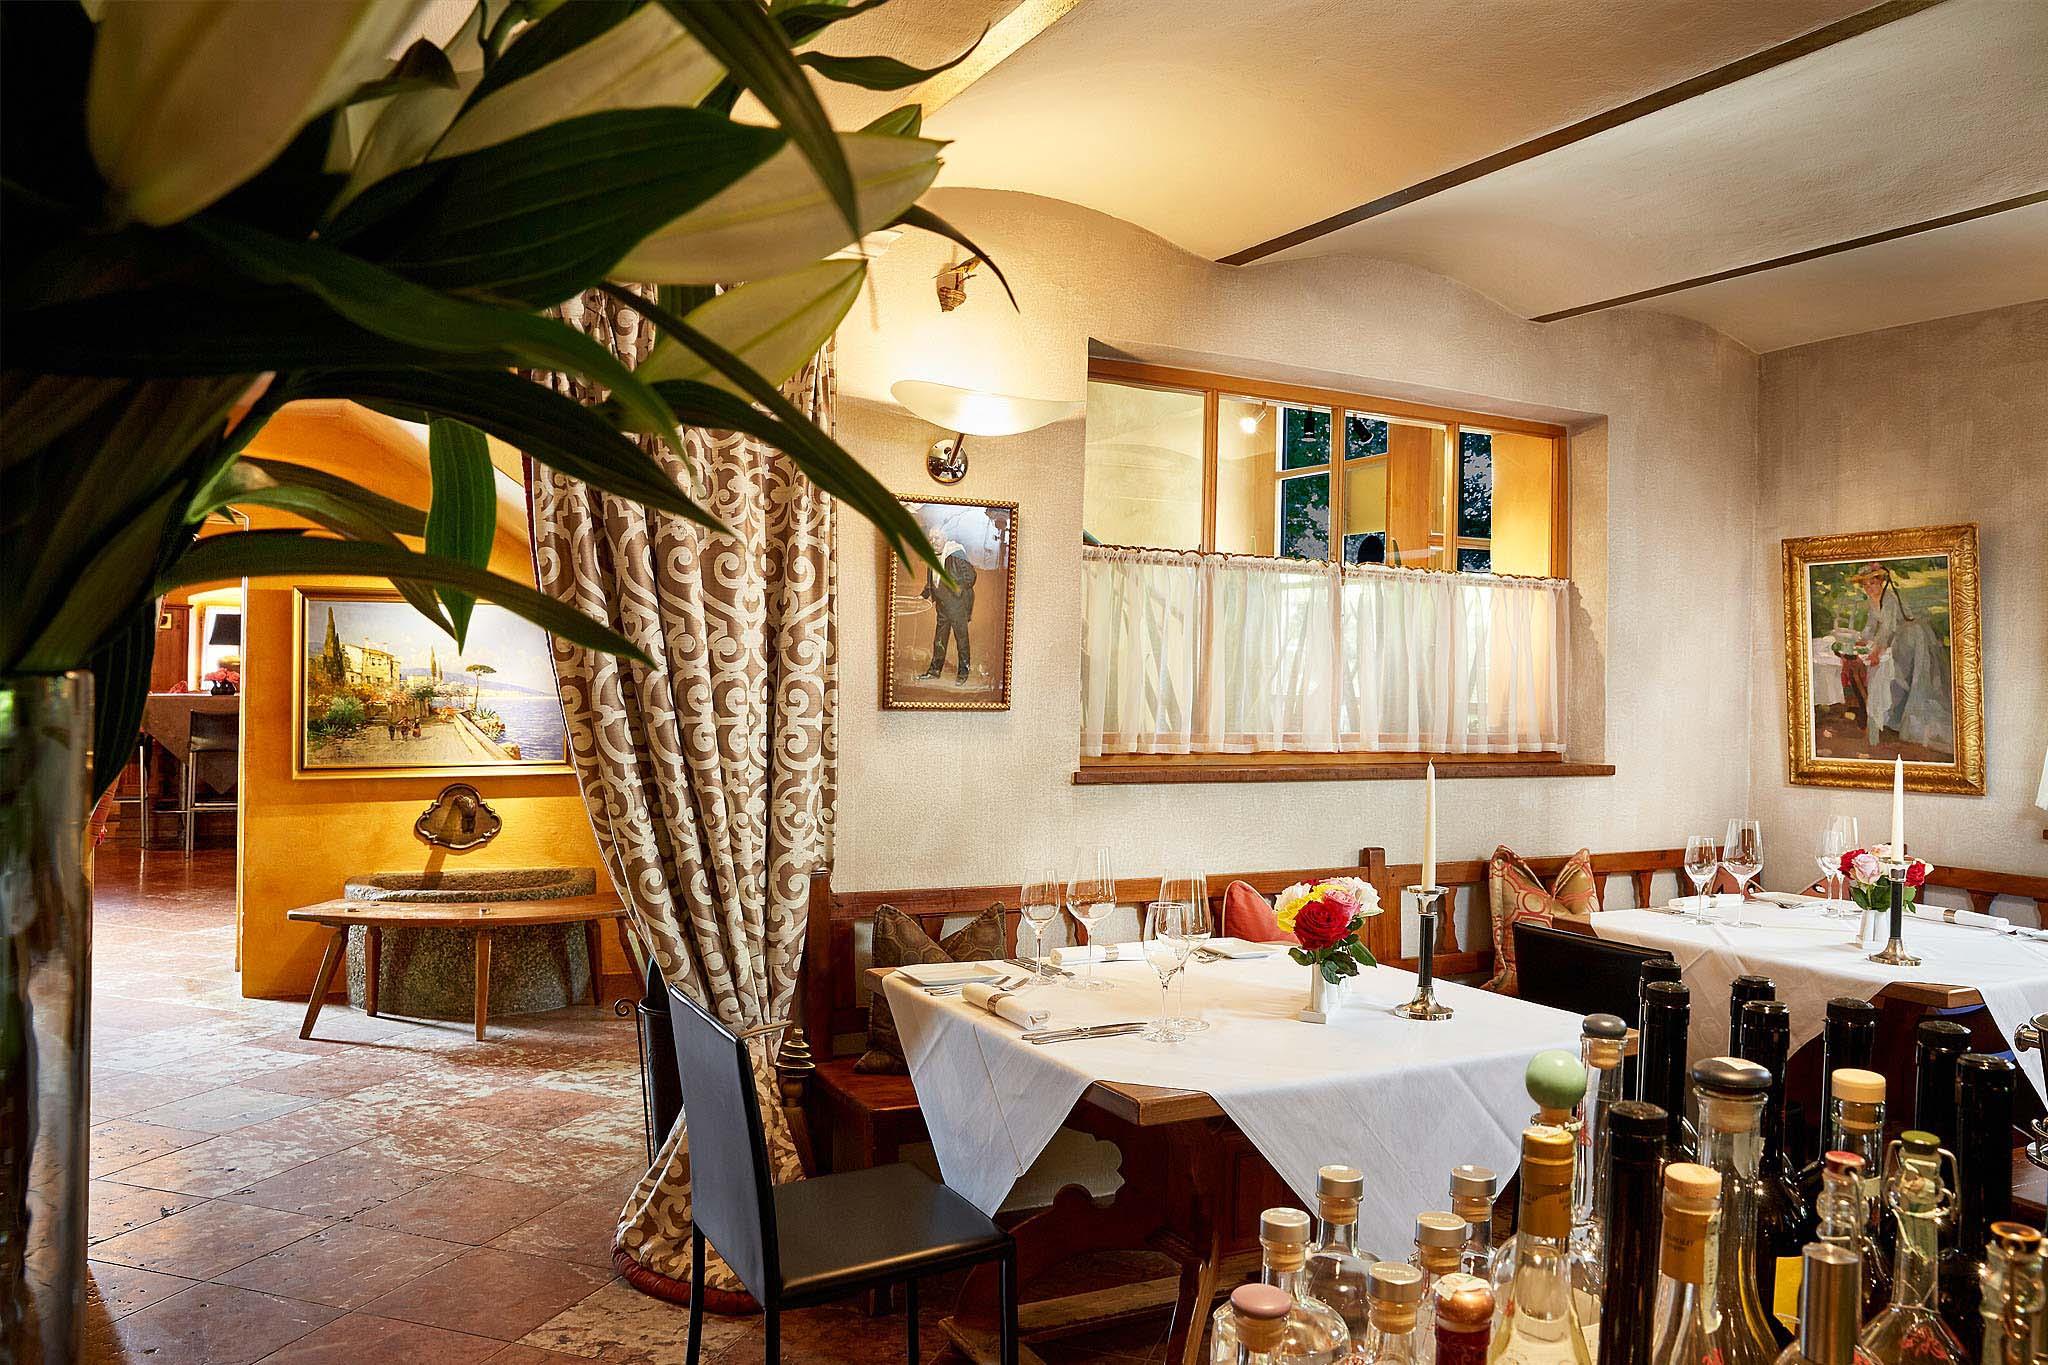 buberlgut-restaurant-salzburg-gute-stube-2